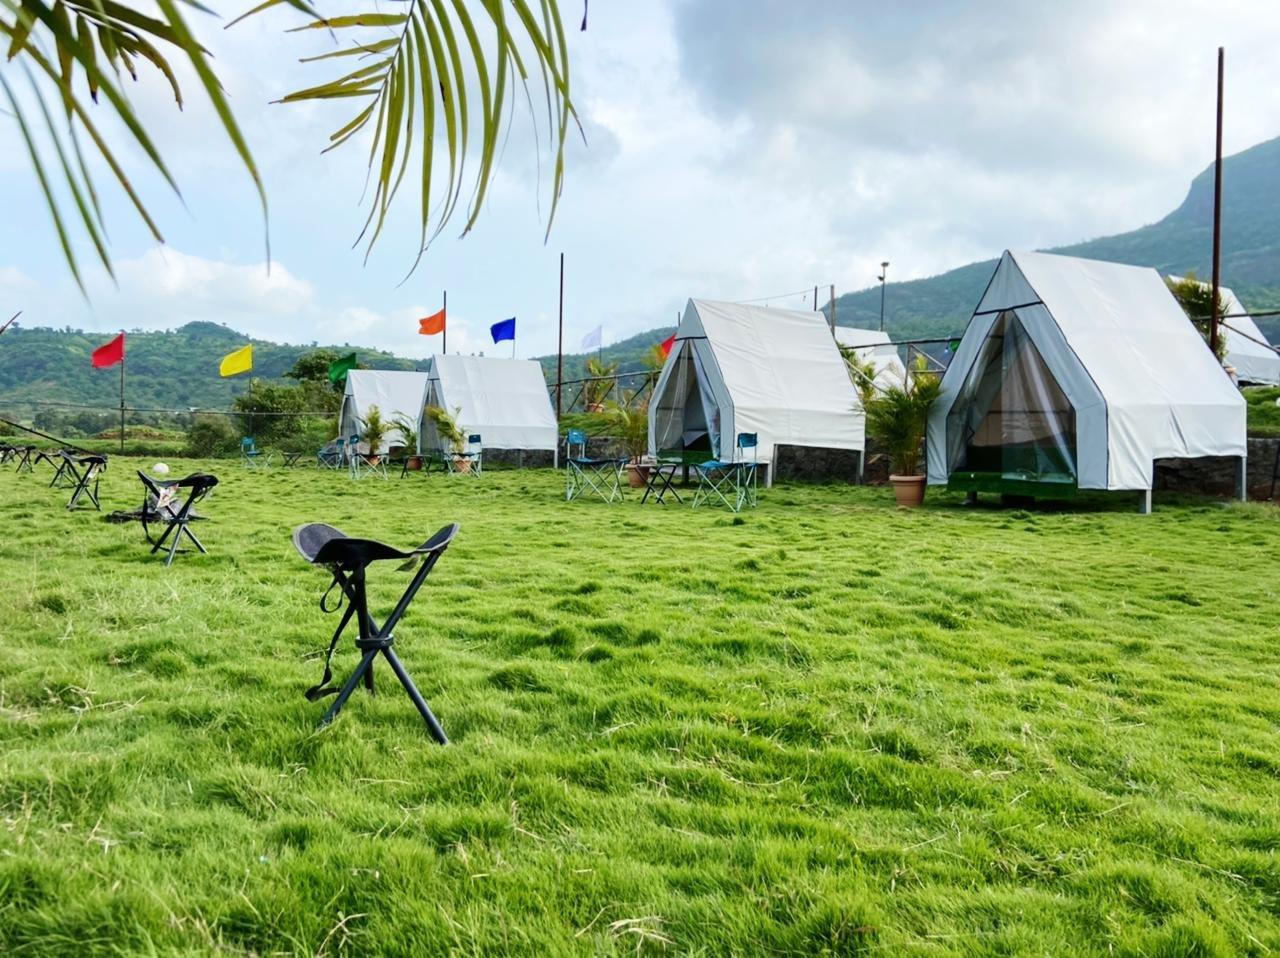 Malshej Ghat Camping